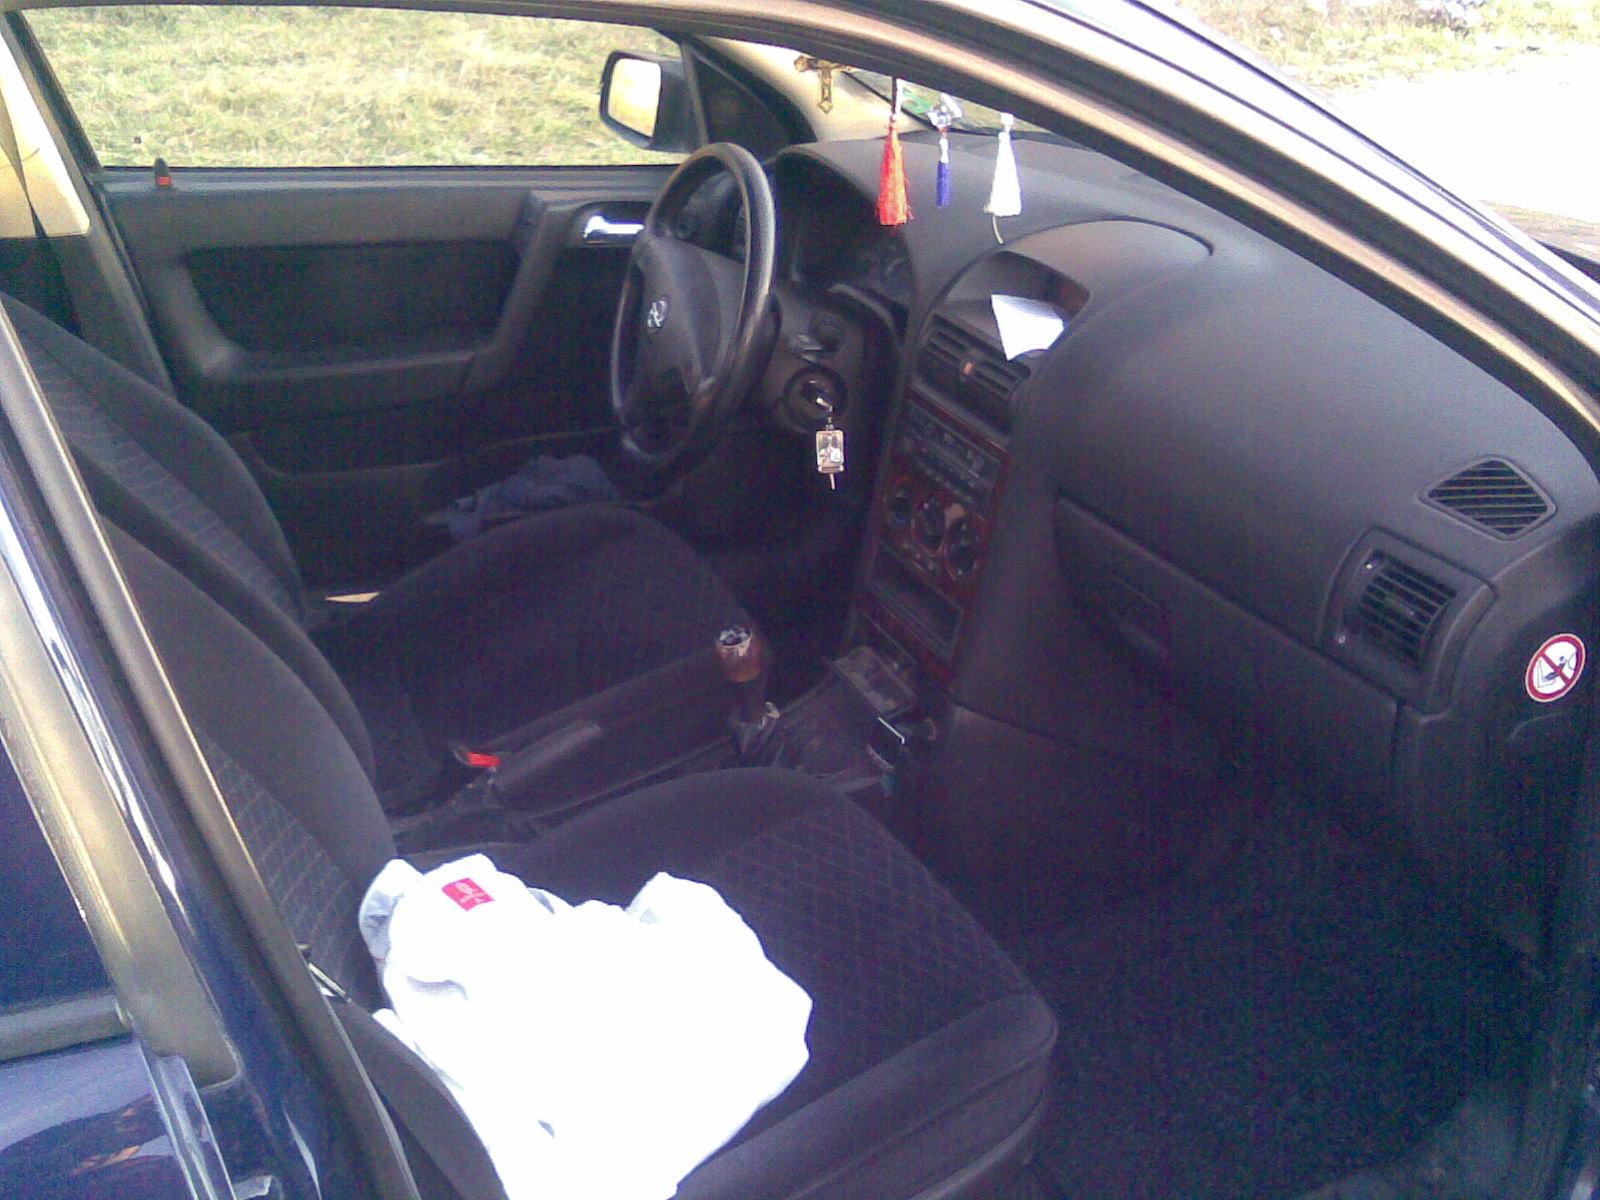 Opel Astra-G avariat 2000 Diesel Hatchback - 18 Februarie 2011 - Poza 1